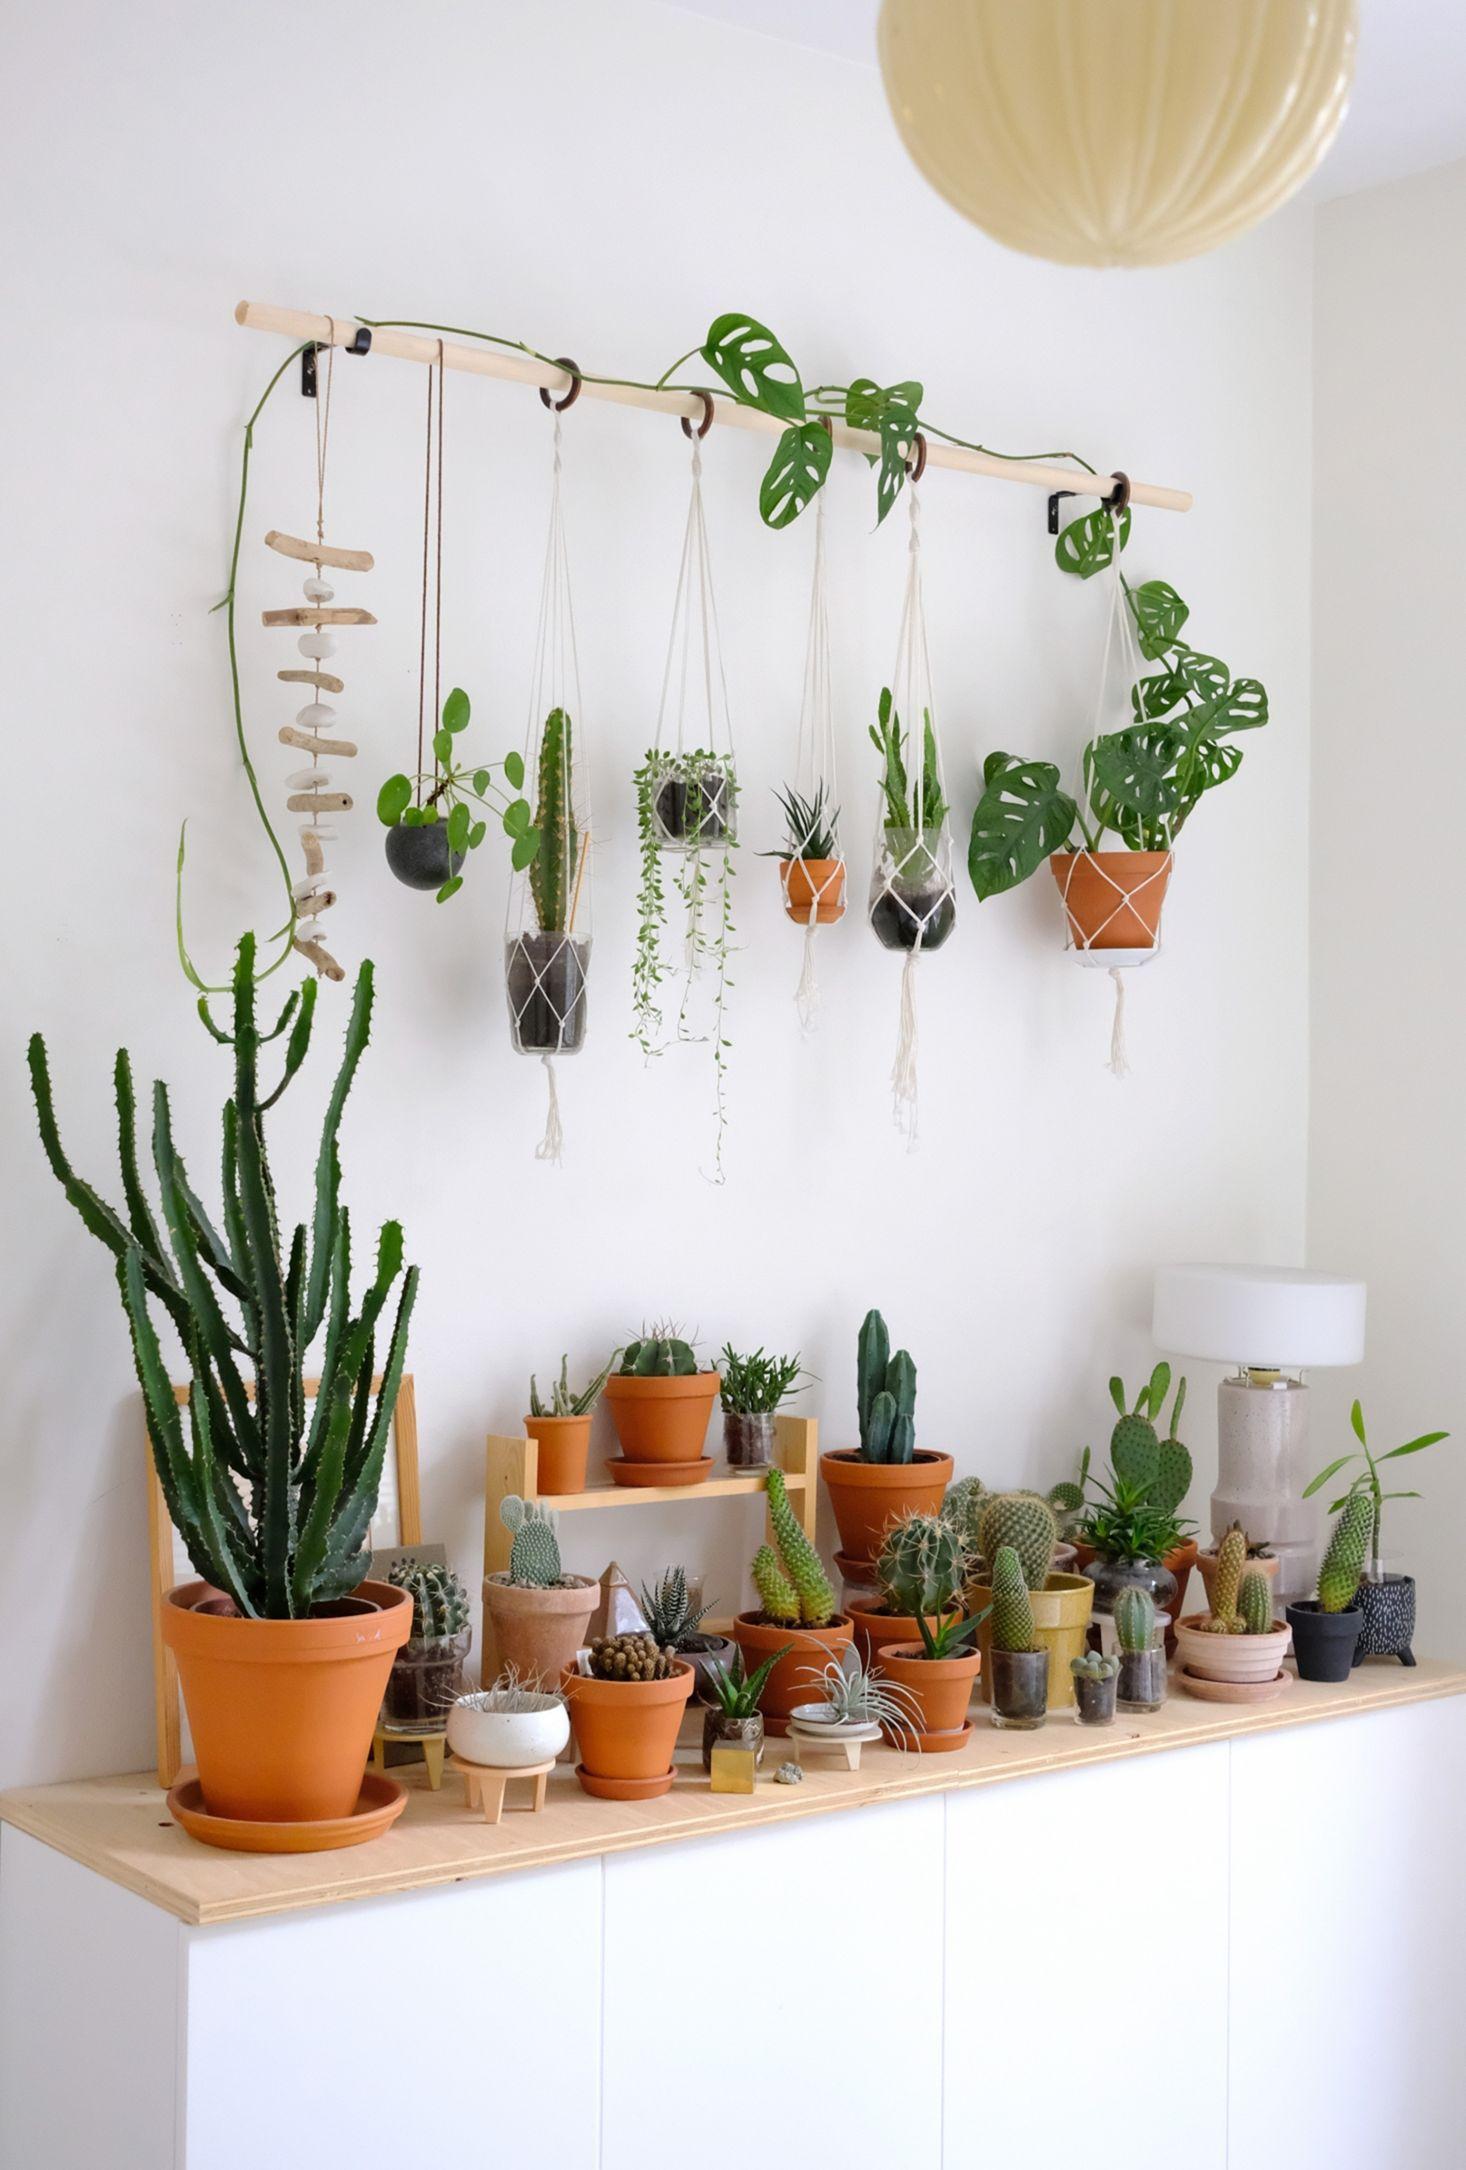 15 simple beautiful indoor plants decor for living room on indoor herb garden diy apartments living walls id=74009